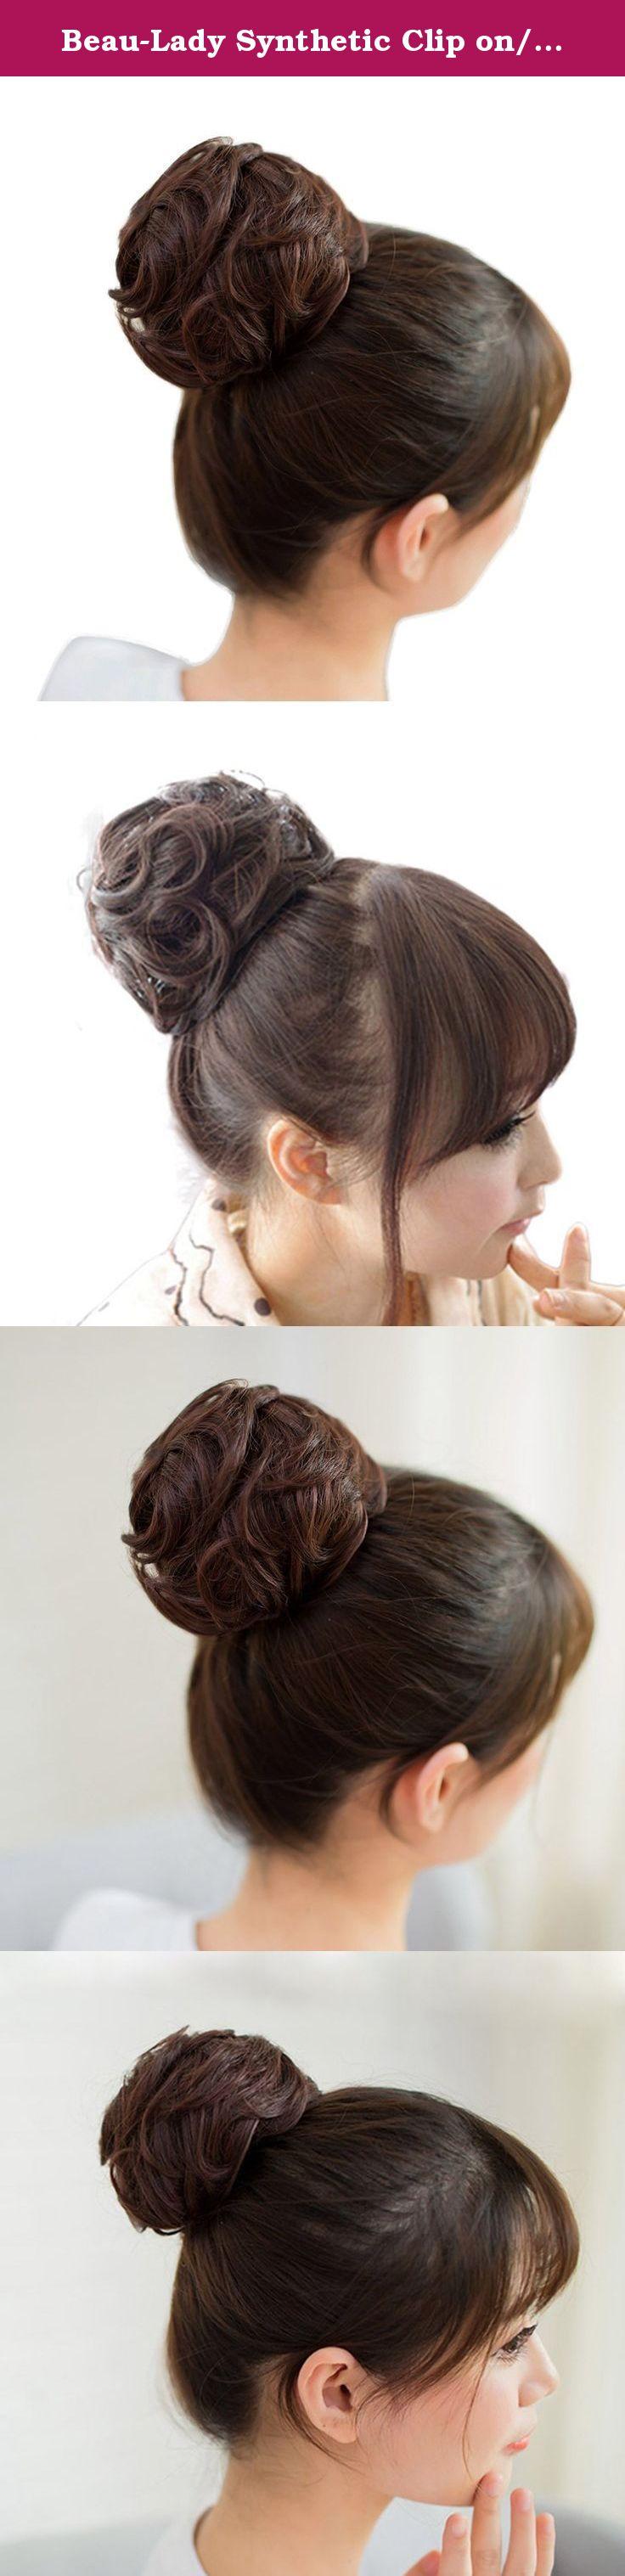 Beau Lady Synthetic Clip Onin Messy Hair Bun Extension Chignon Hair